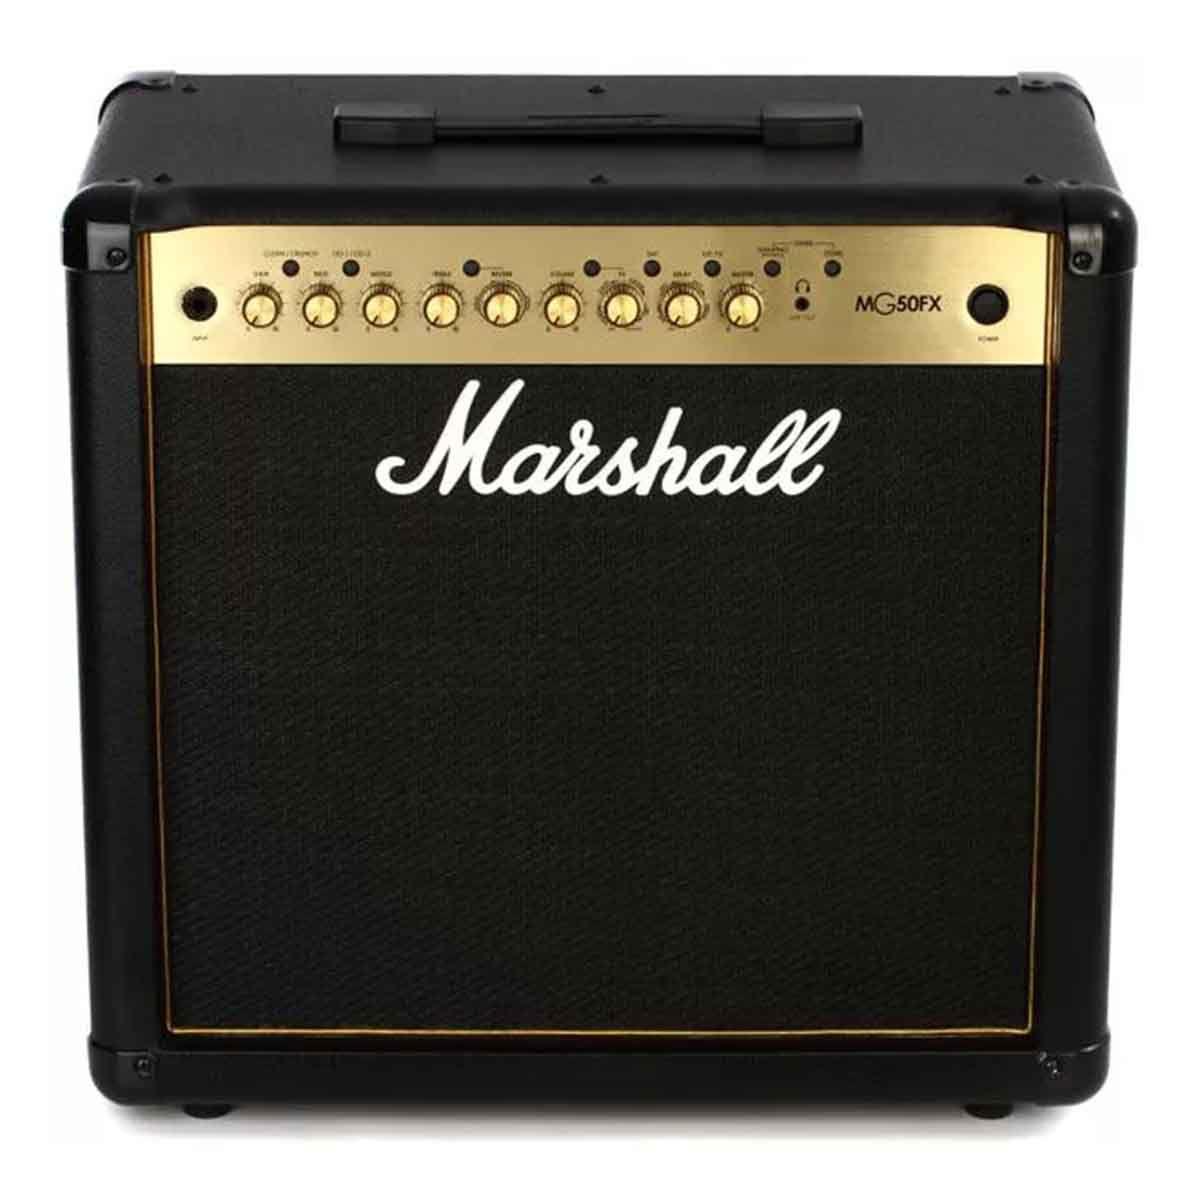 Caixa Amplificada Marshall MG50FX Gold 50W para Guitarra